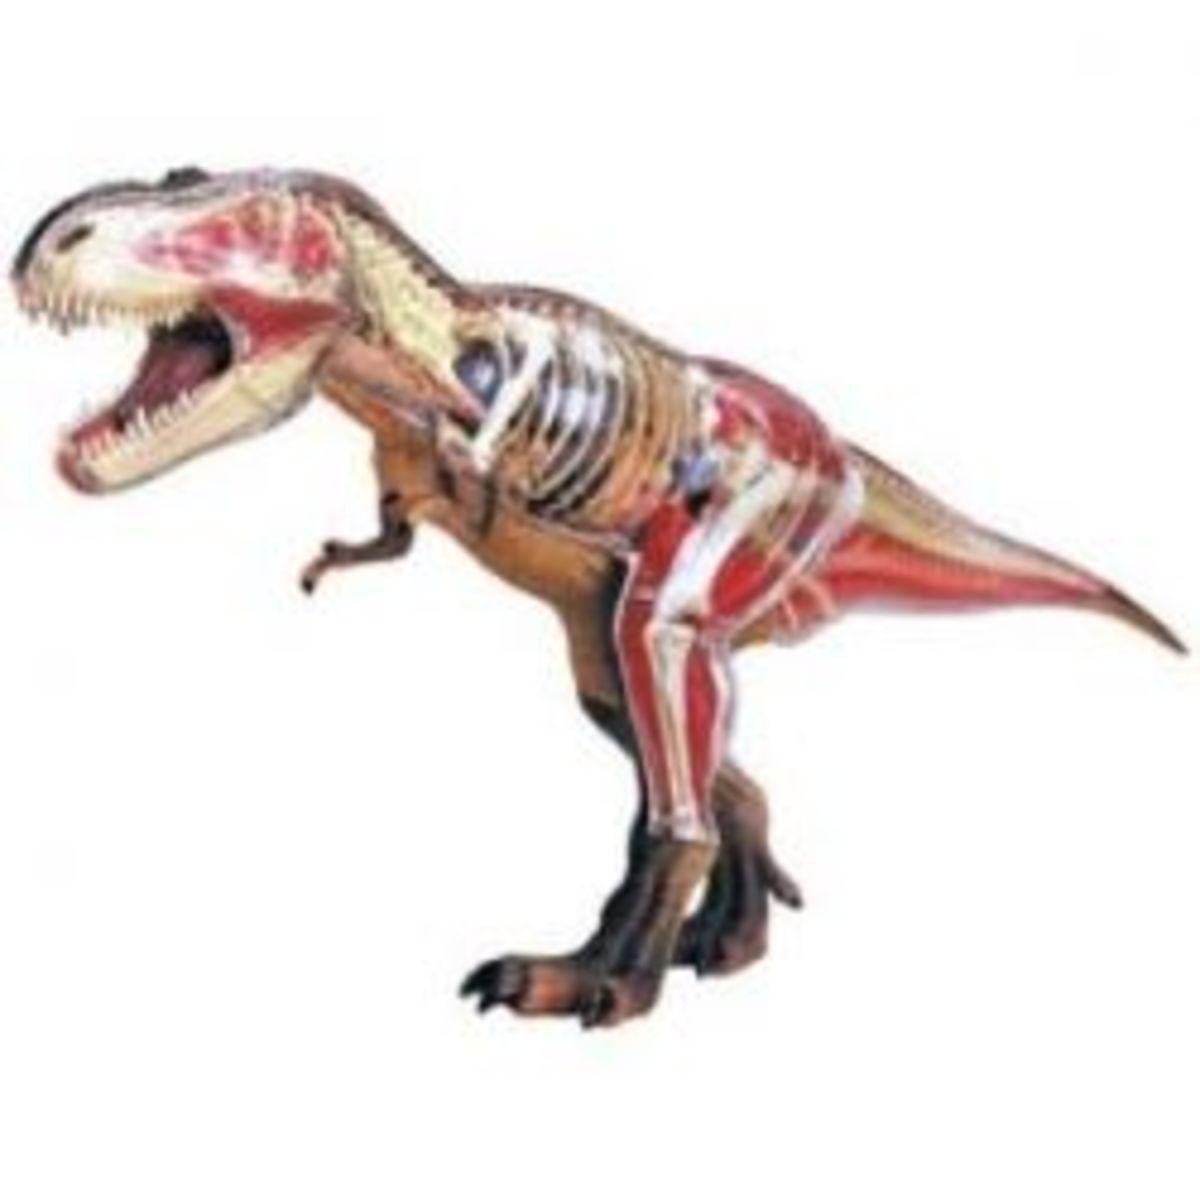 4D Vision Tyrannosaurus Rex Anatomy Model